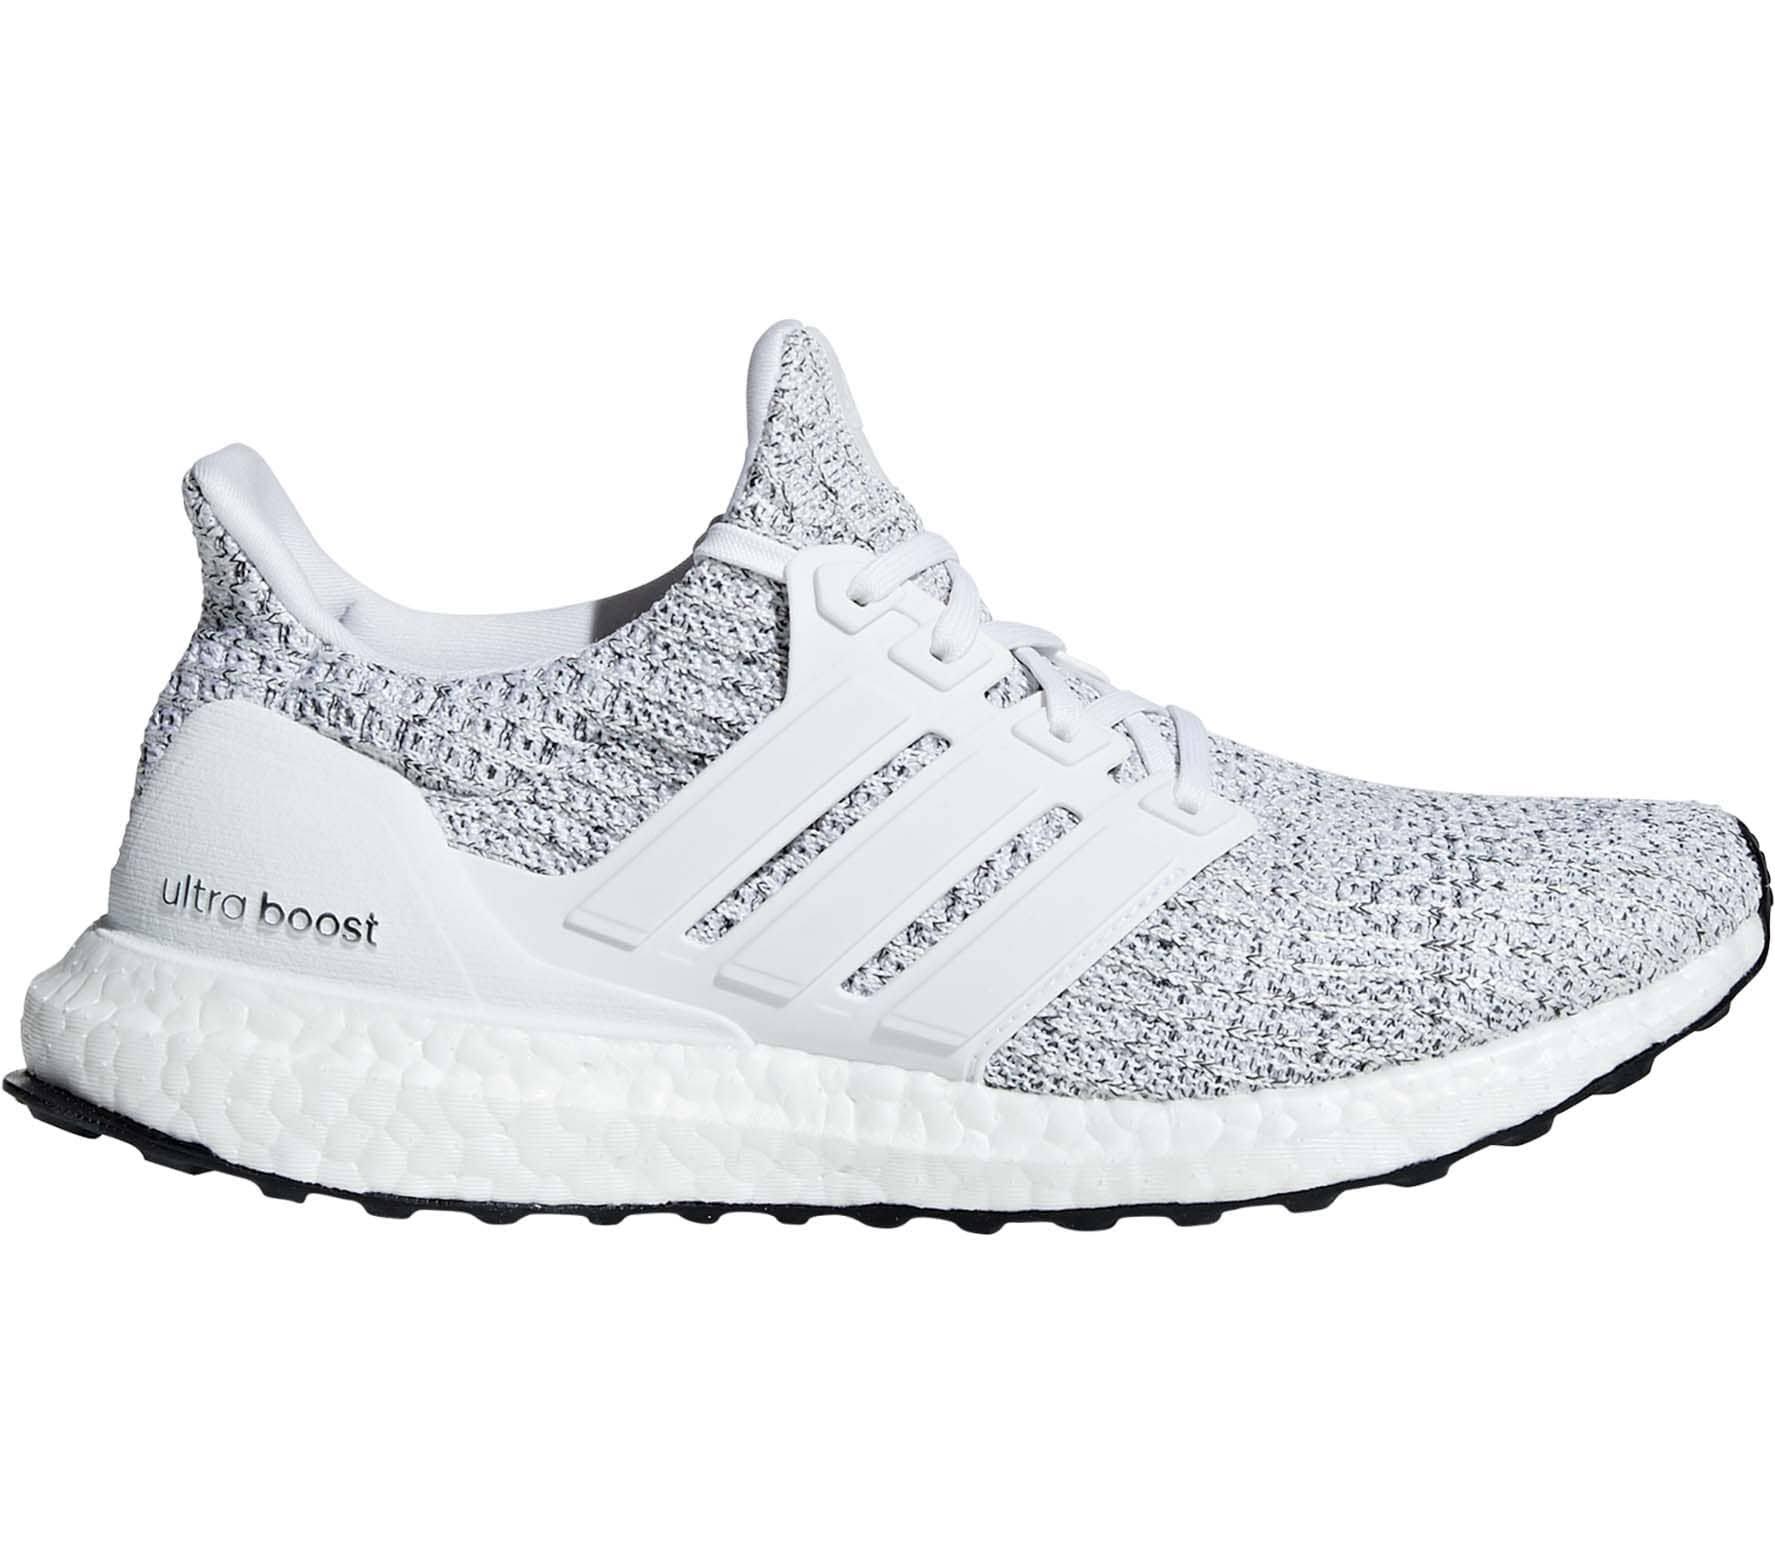 Sneaker Hellgrau 37 Grau Boost Performance Adidas weiß W Ultra xqIIZS